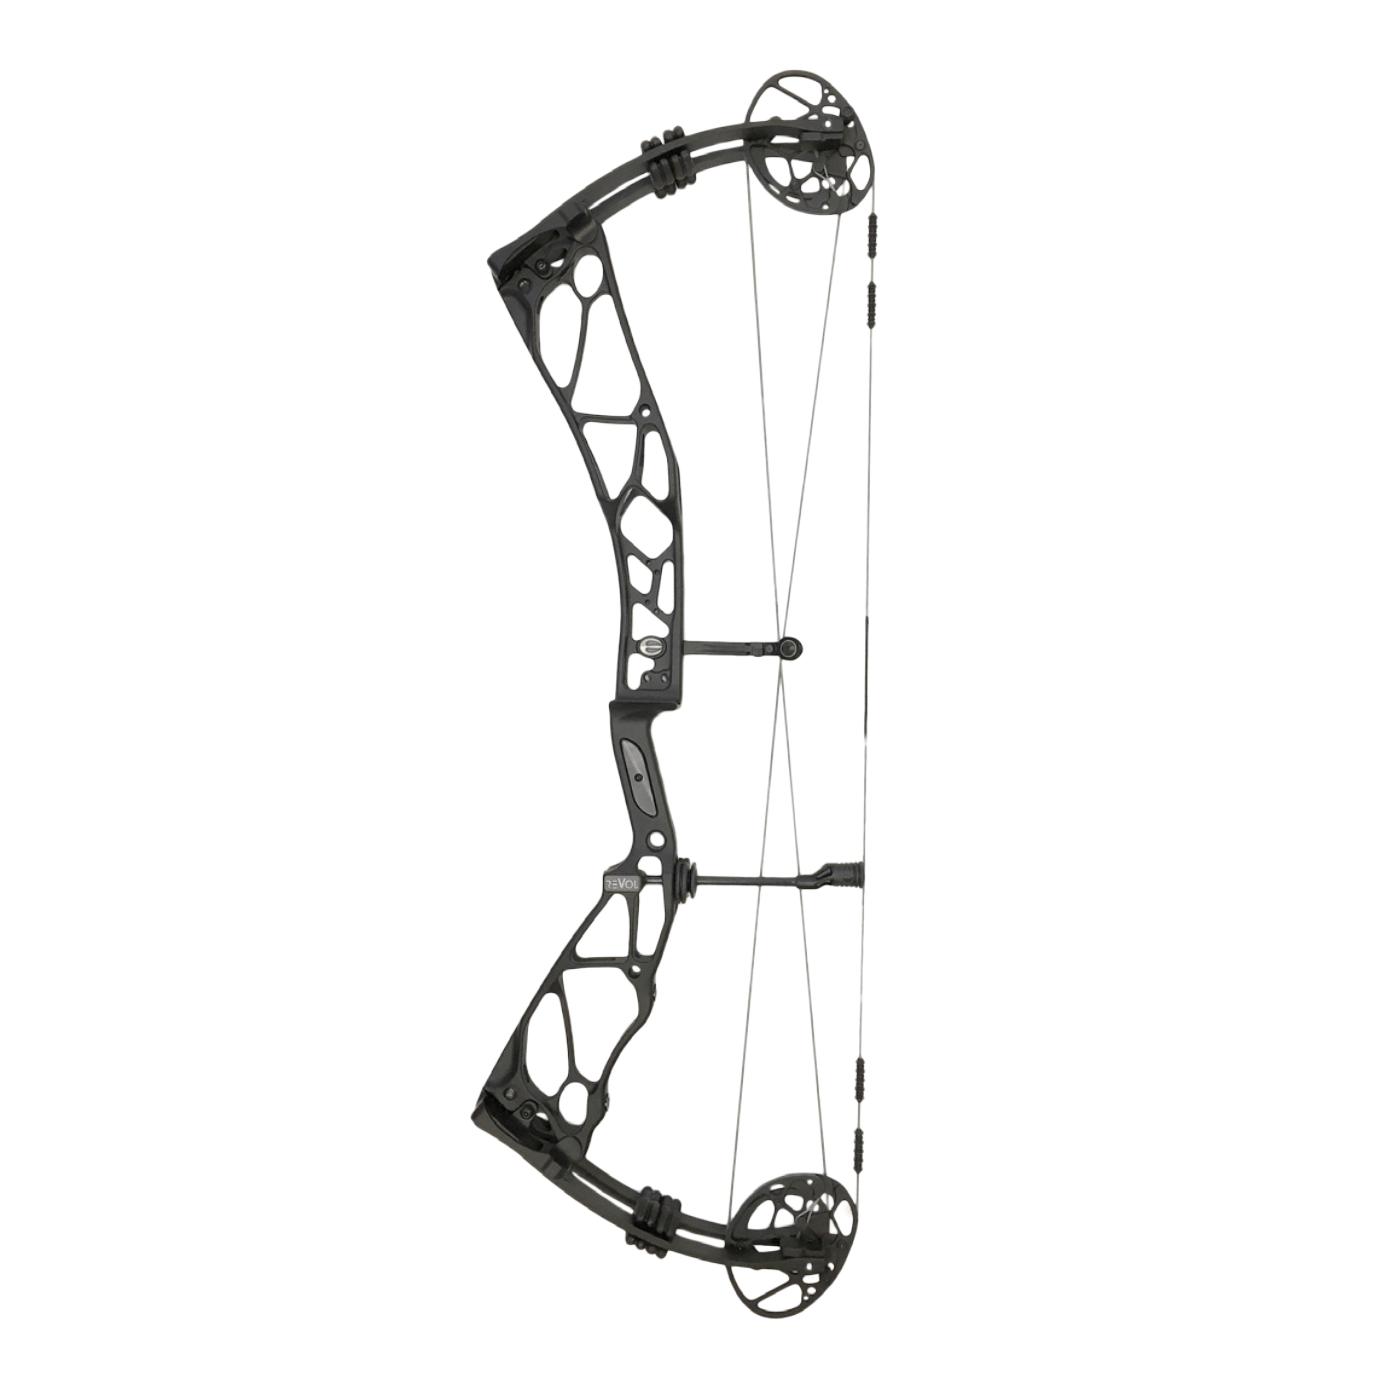 Elite archery REVOL compound bow